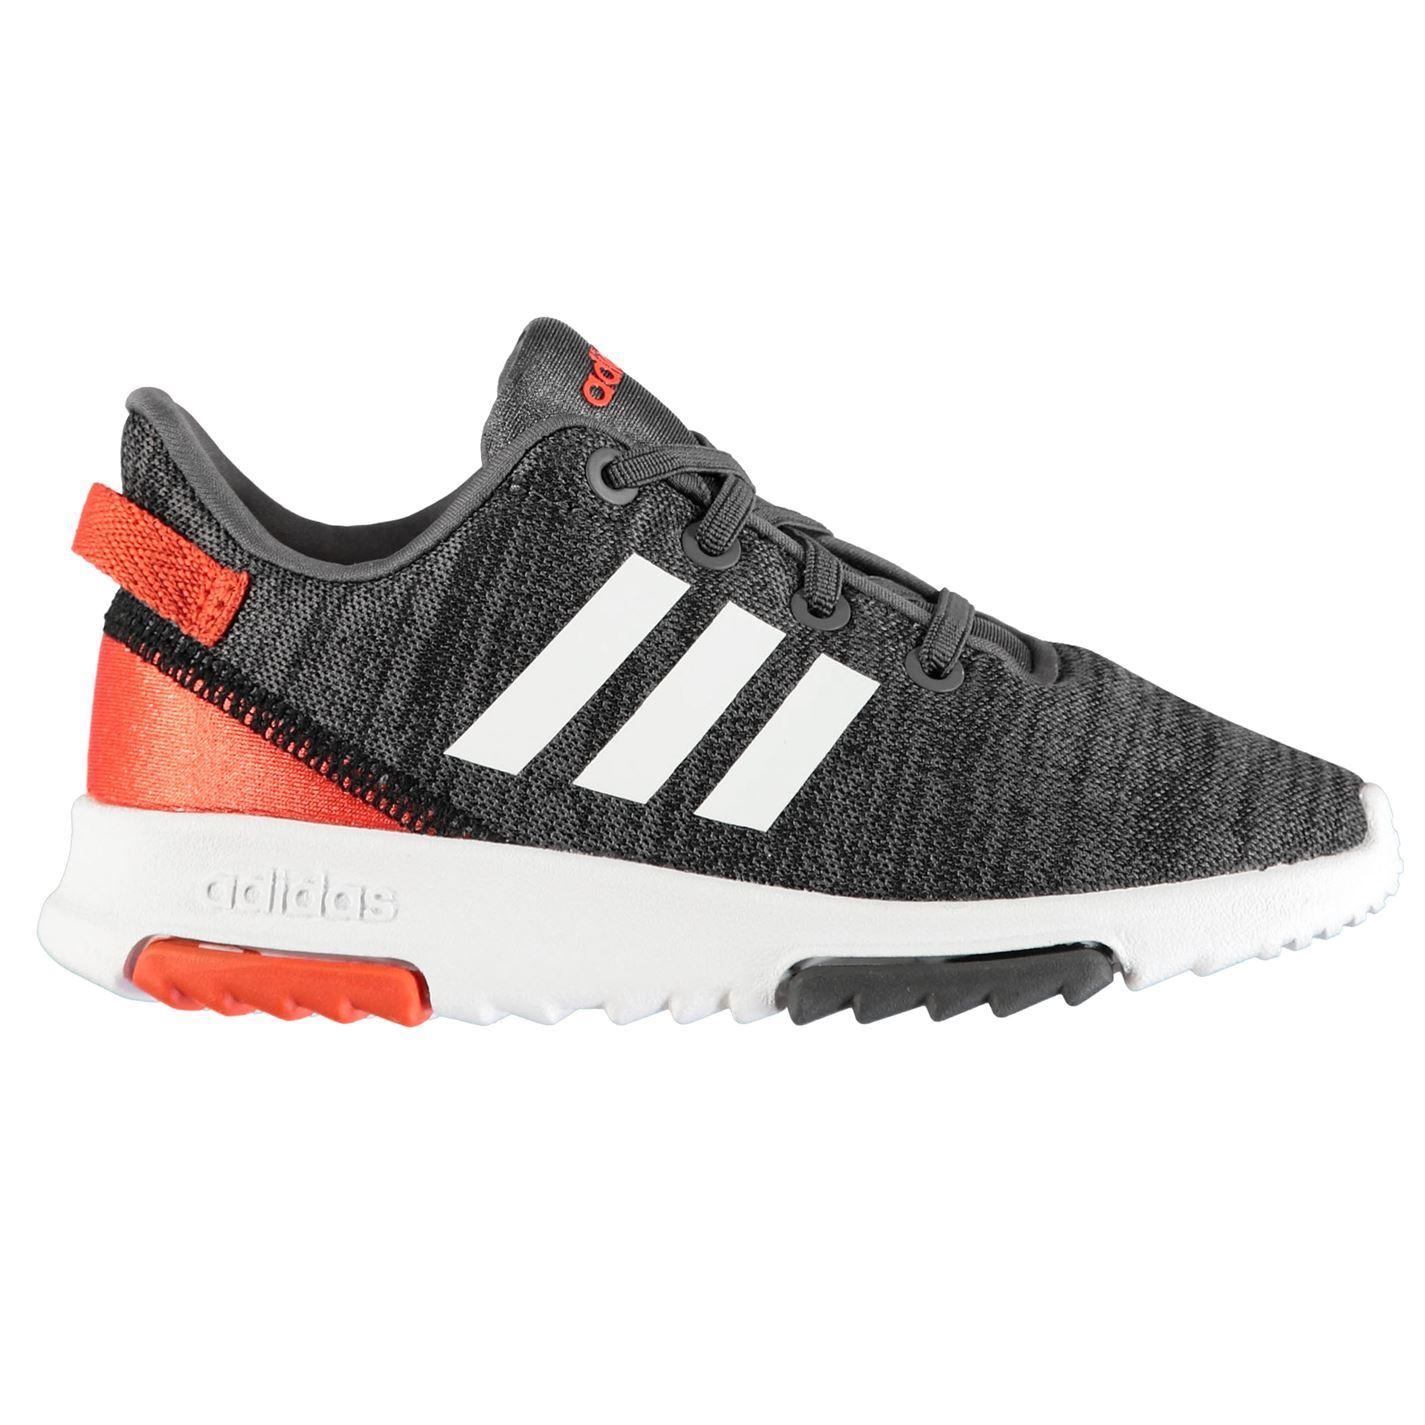 chaussures adidas enfant 24